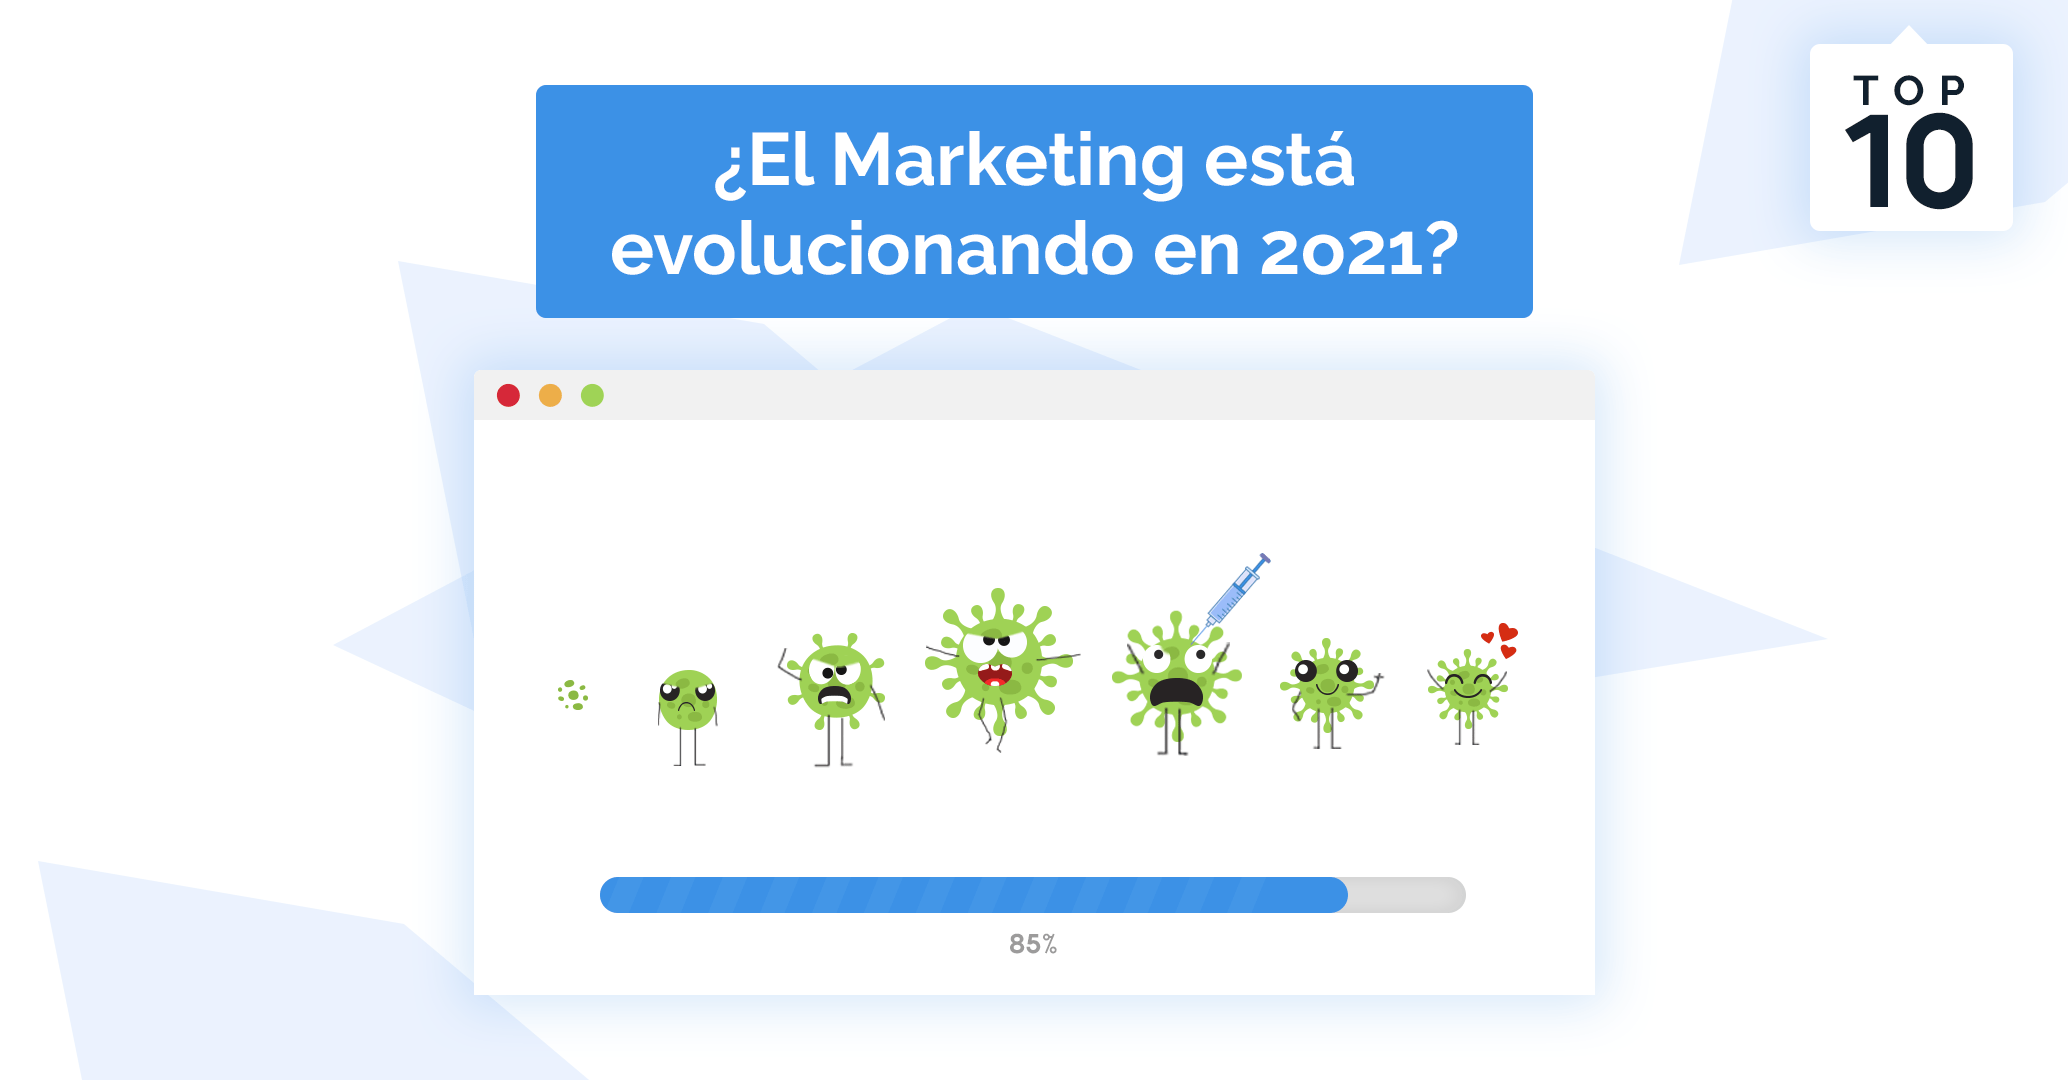 Top 10 trends del marketing digital para el 2021